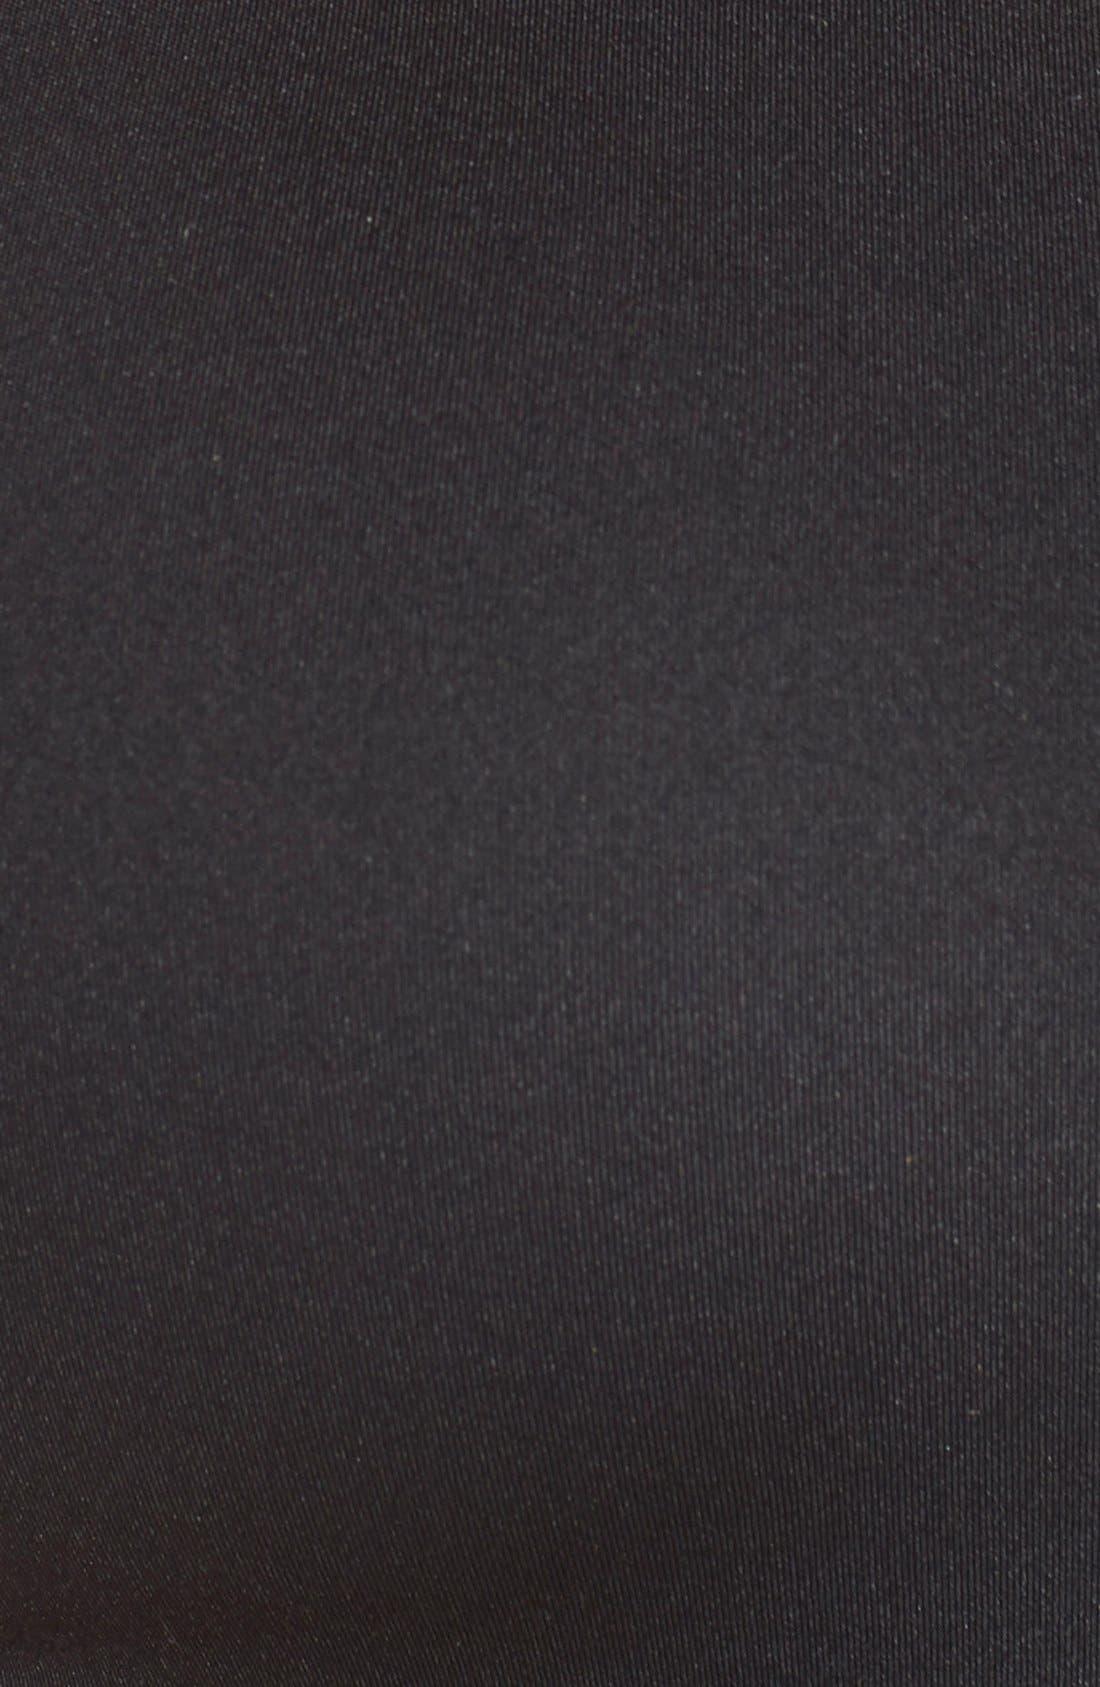 'Uplift' Cross Back Sports Bra,                             Alternate thumbnail 6, color,                             Black